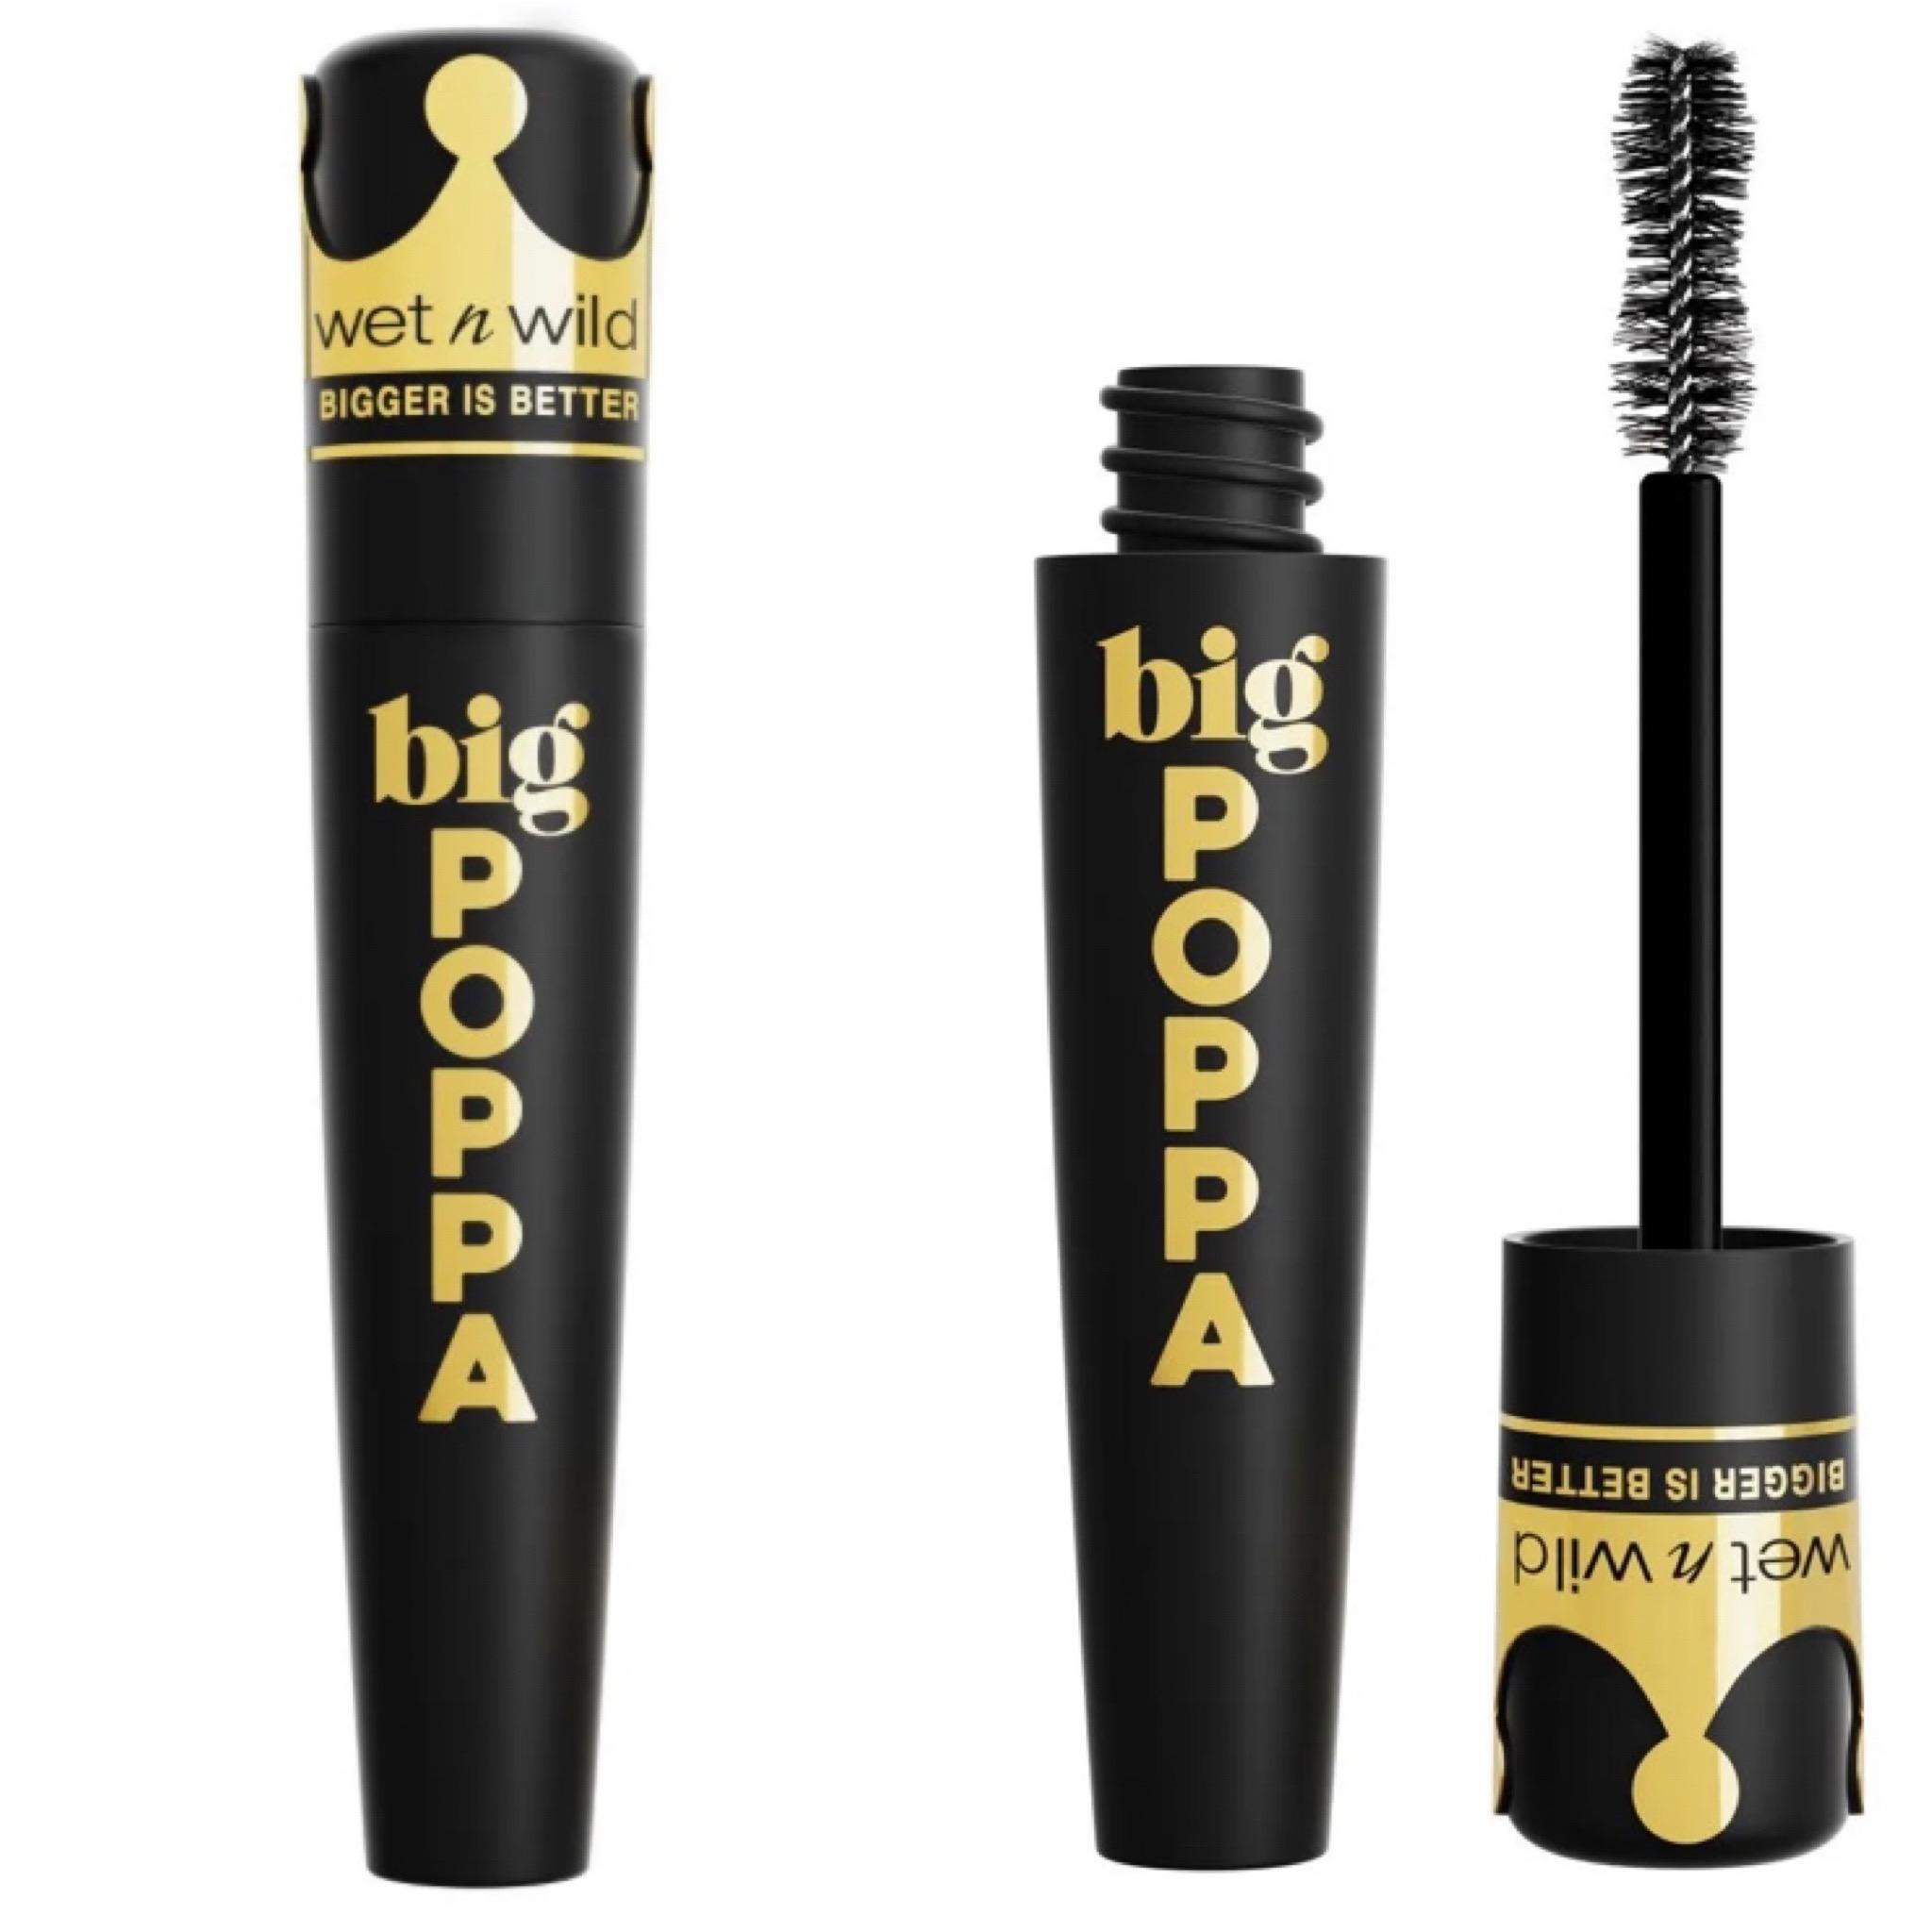 Wet n Wild Big Poppa Mascara